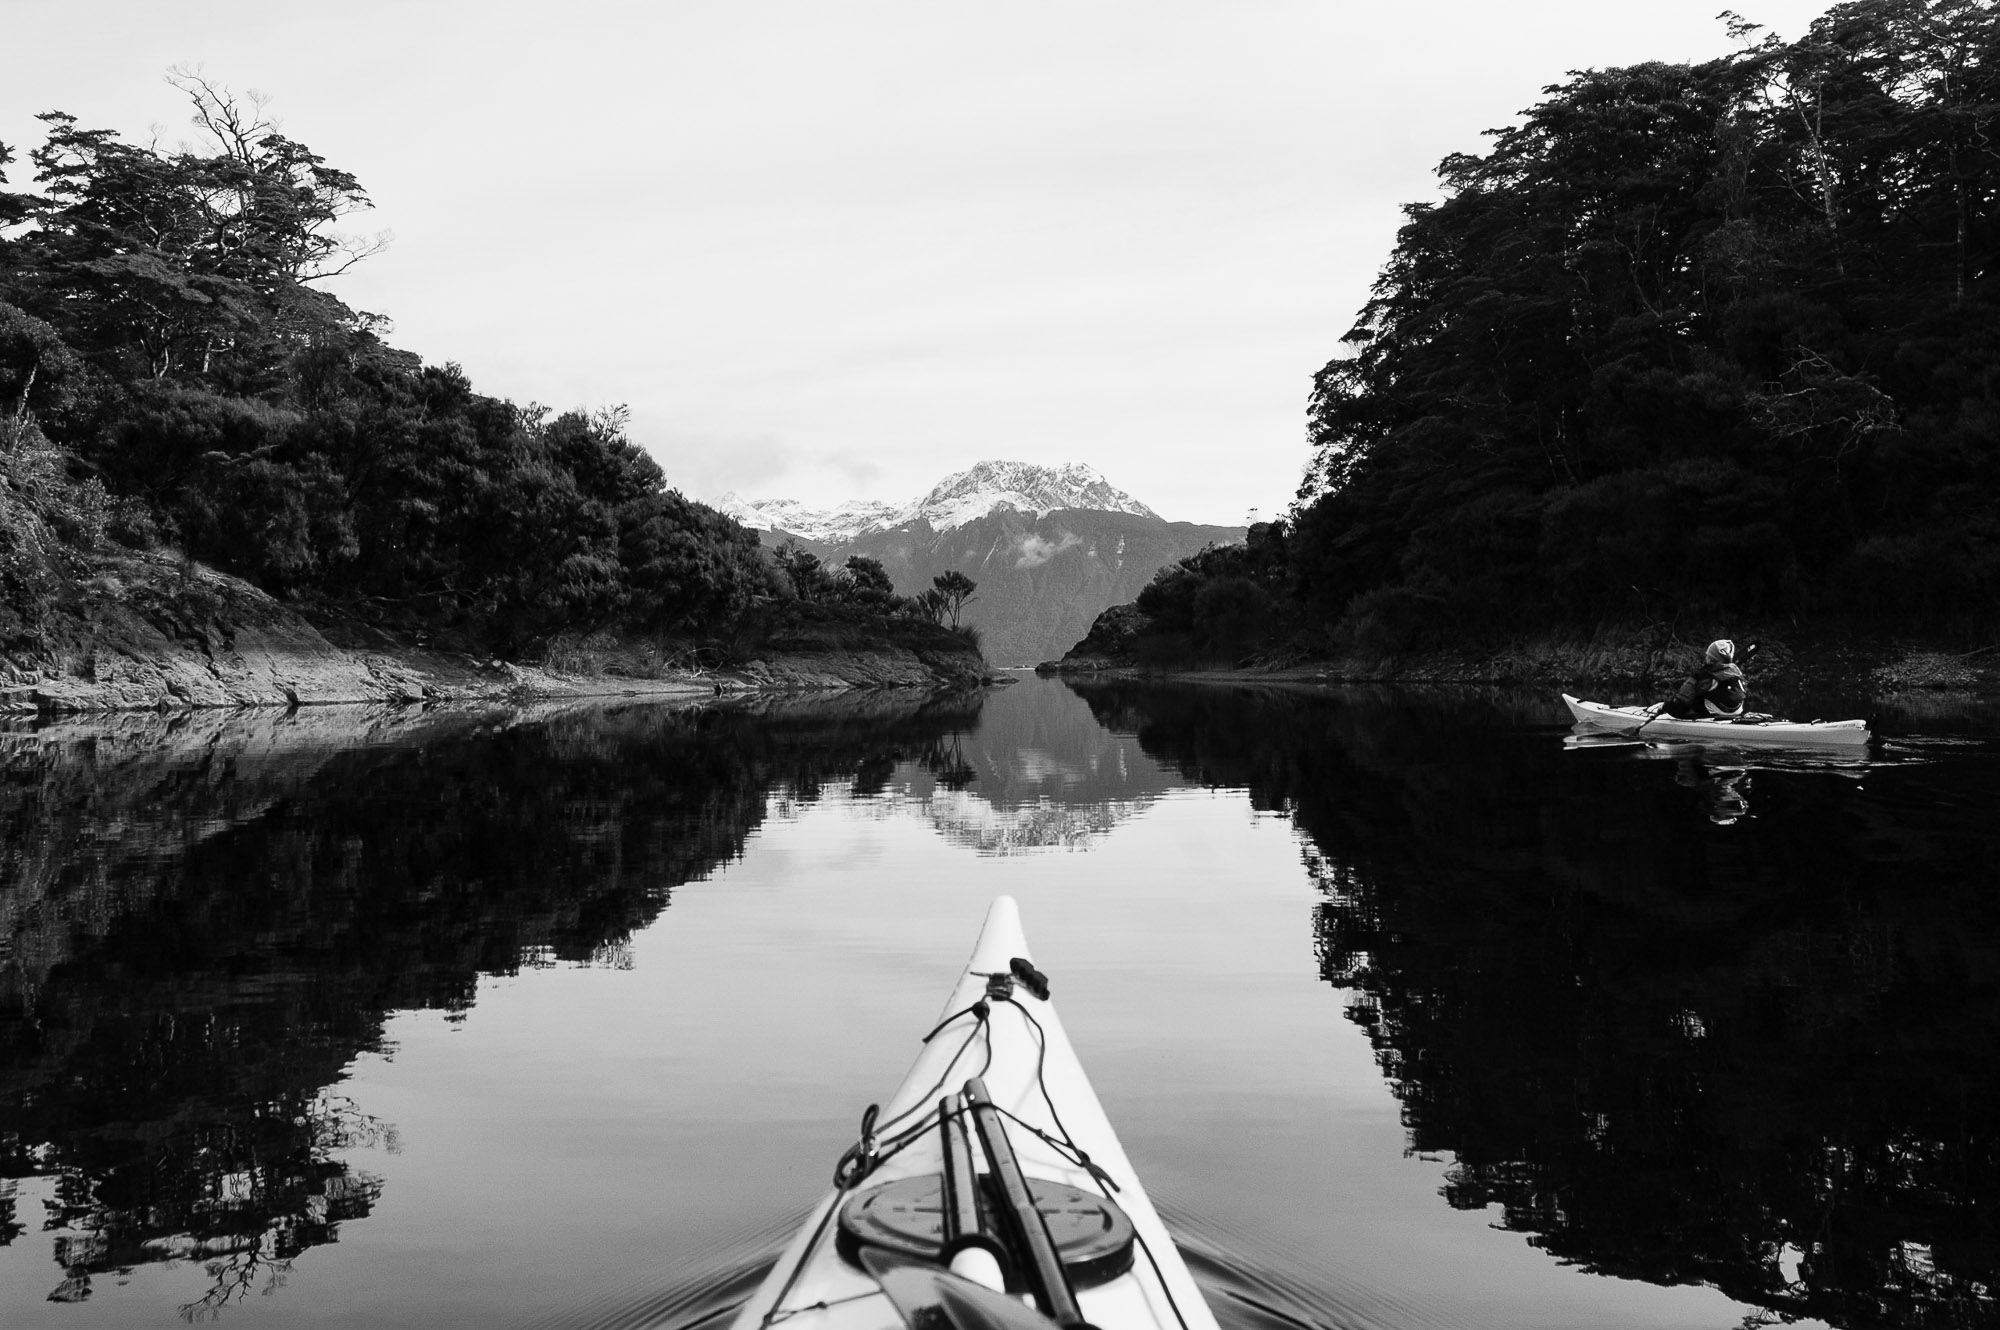 Fiordland National Park, New Zealand. © www.thomaspickard.com